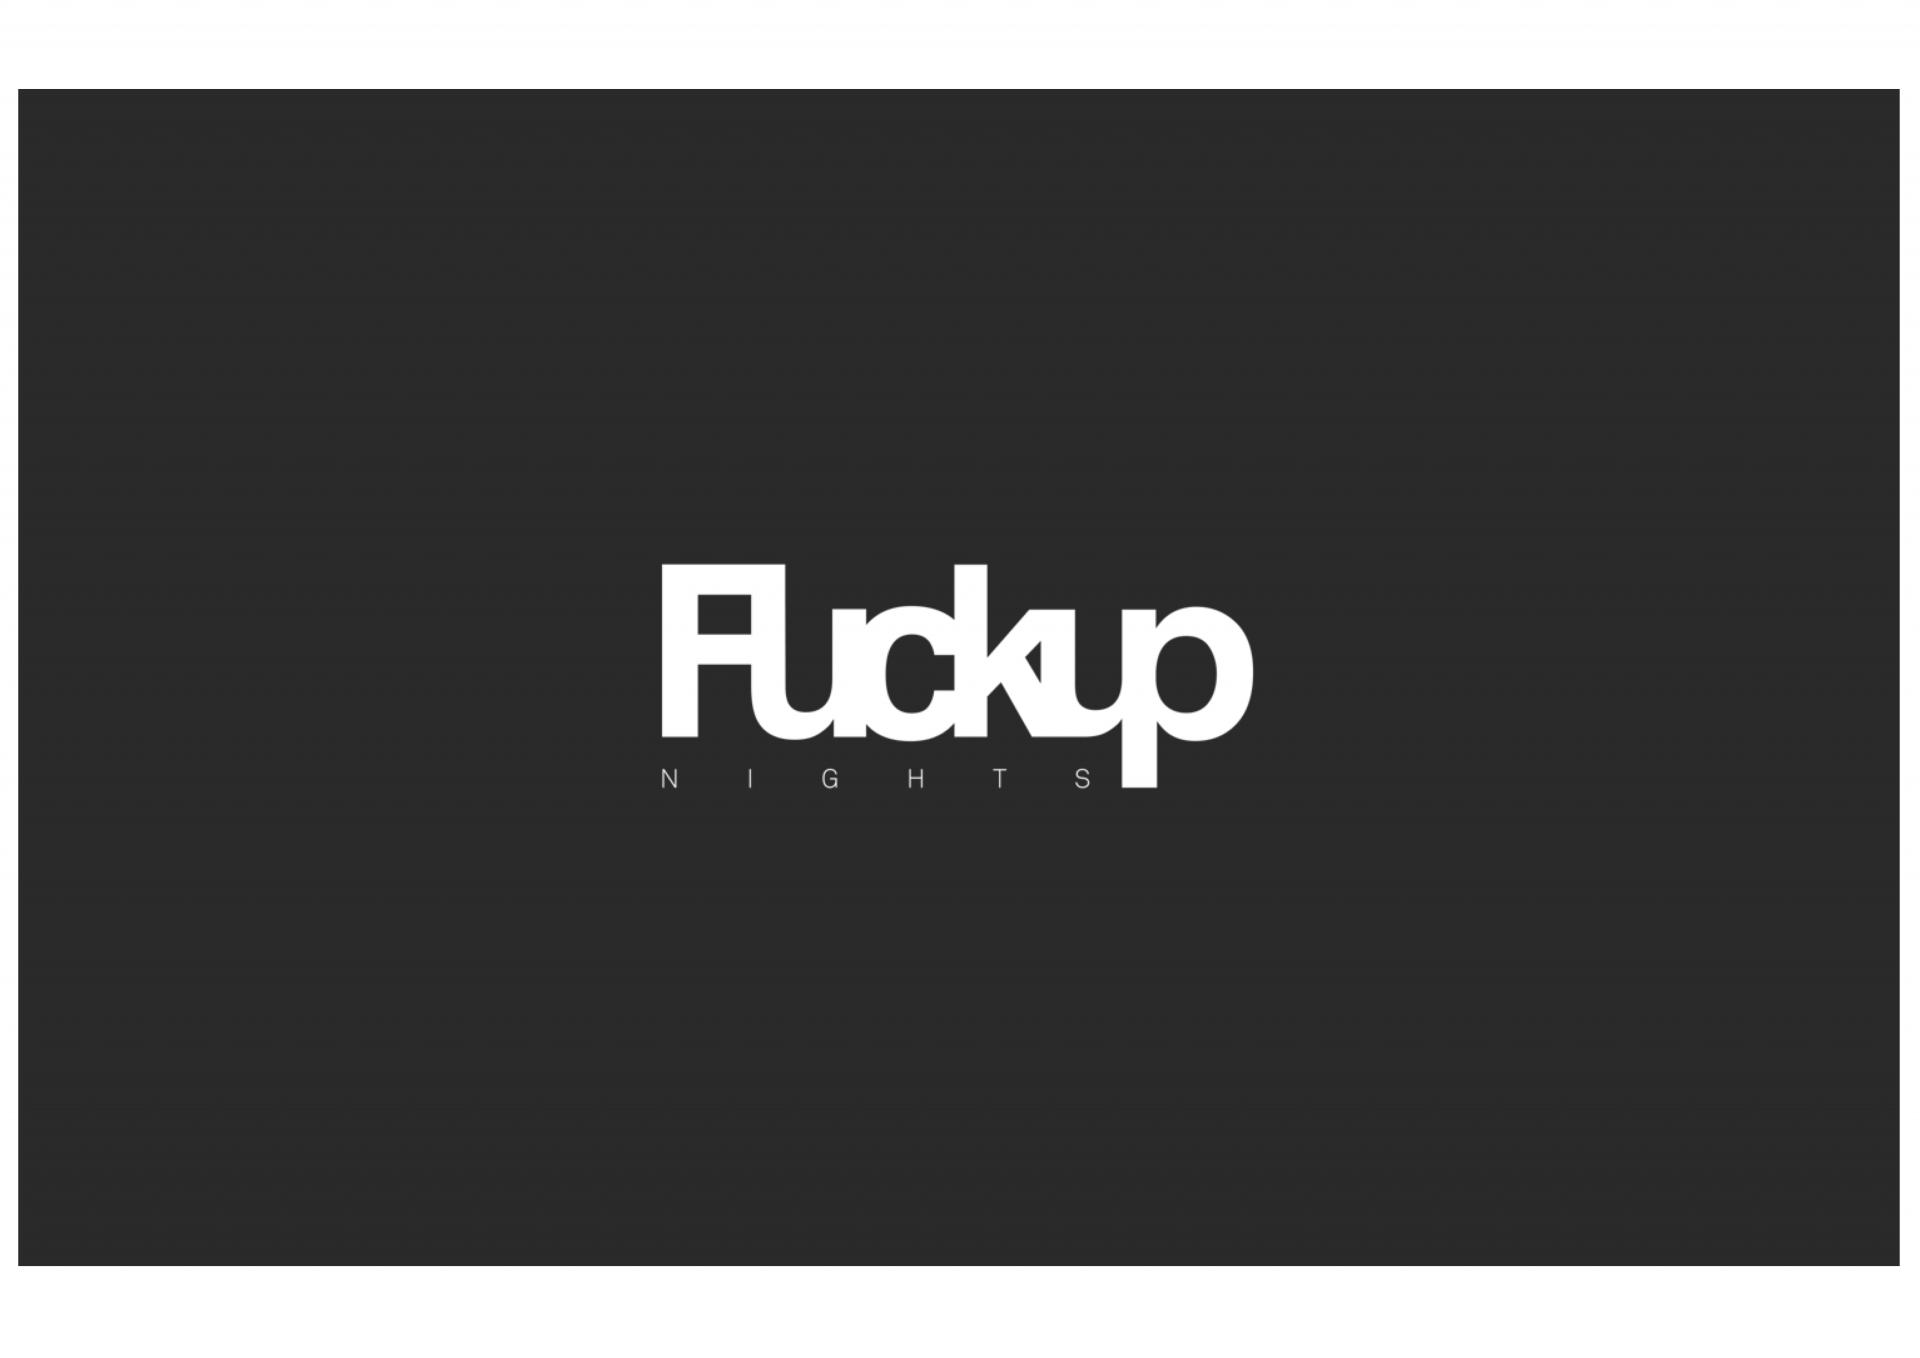 FuckupNights MU Logo